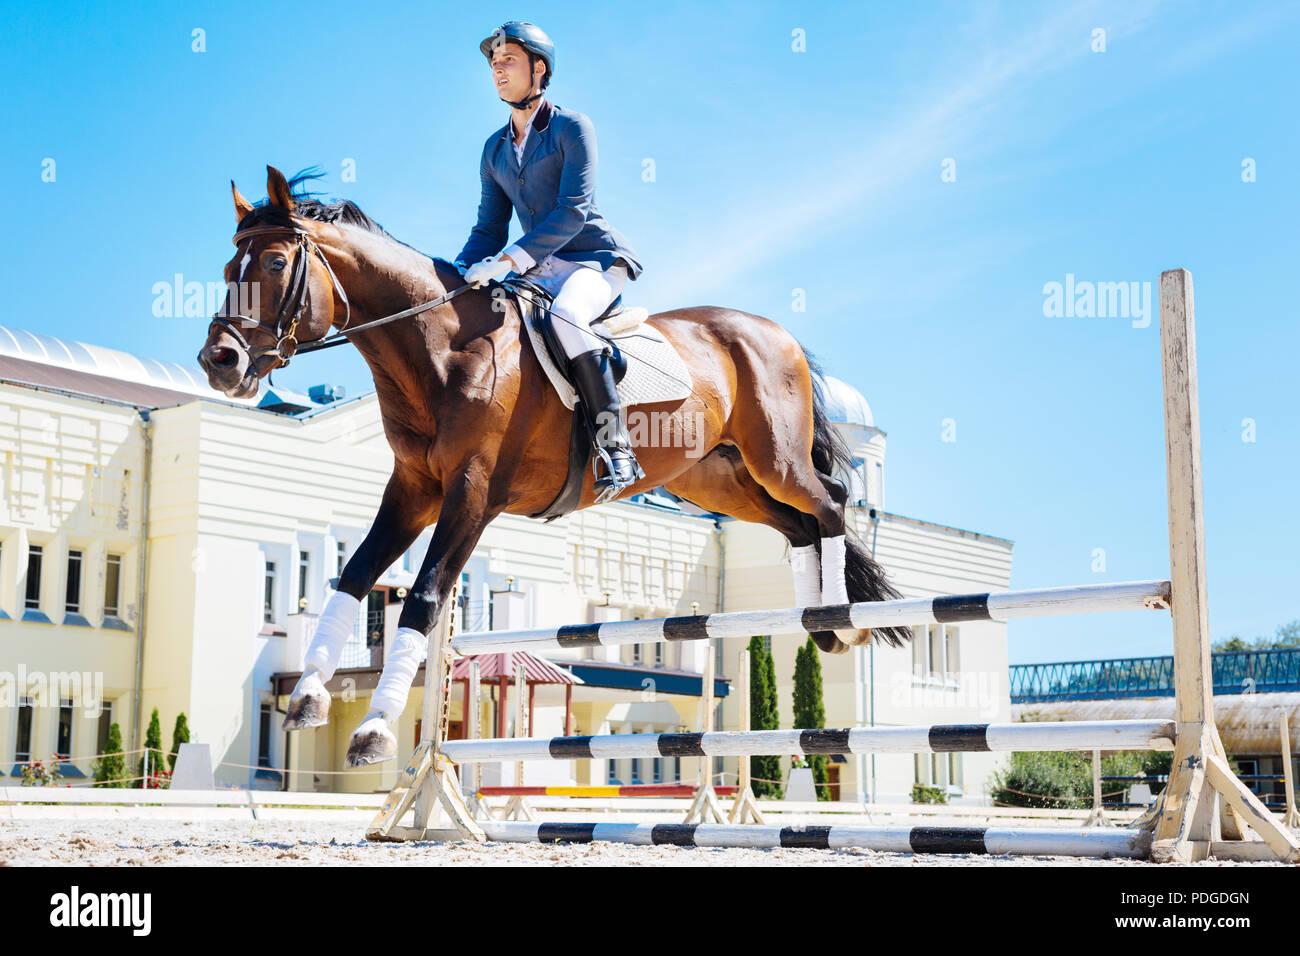 Professional dark brown racehorse hurdling very fast - Stock Image